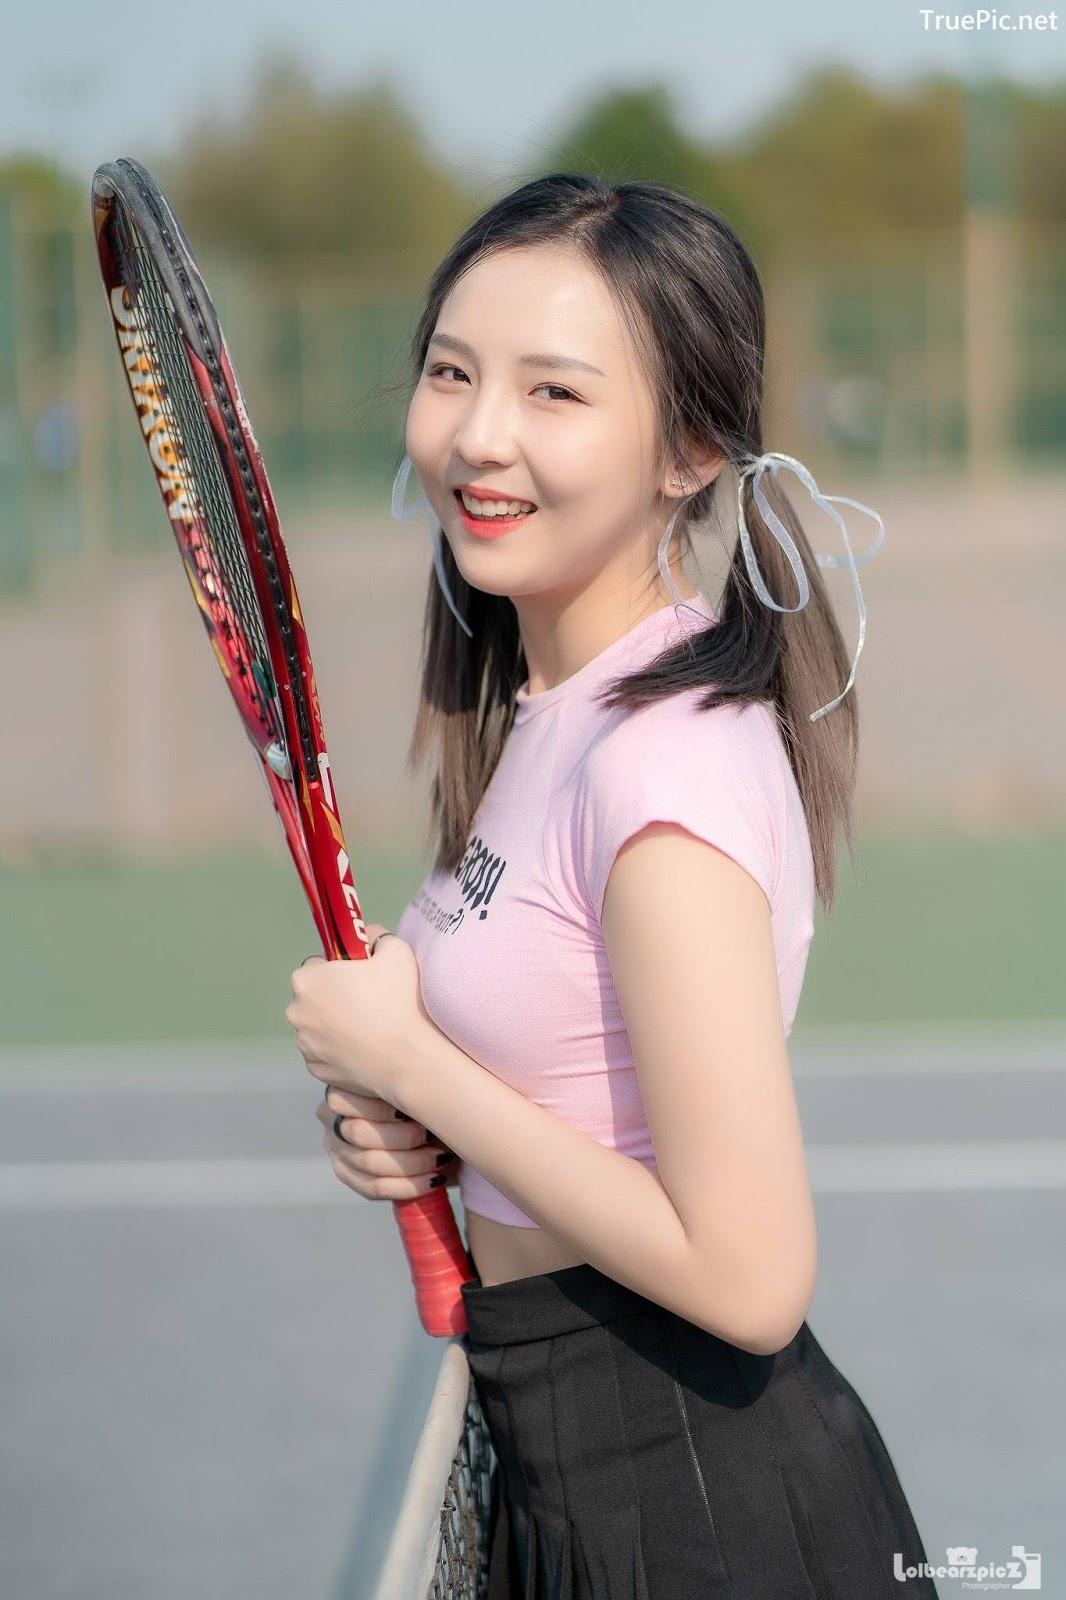 Image Thailand Model - Pattanan Truengjitrarat - Cute Sports Girl - TruePic.net - Picture-6